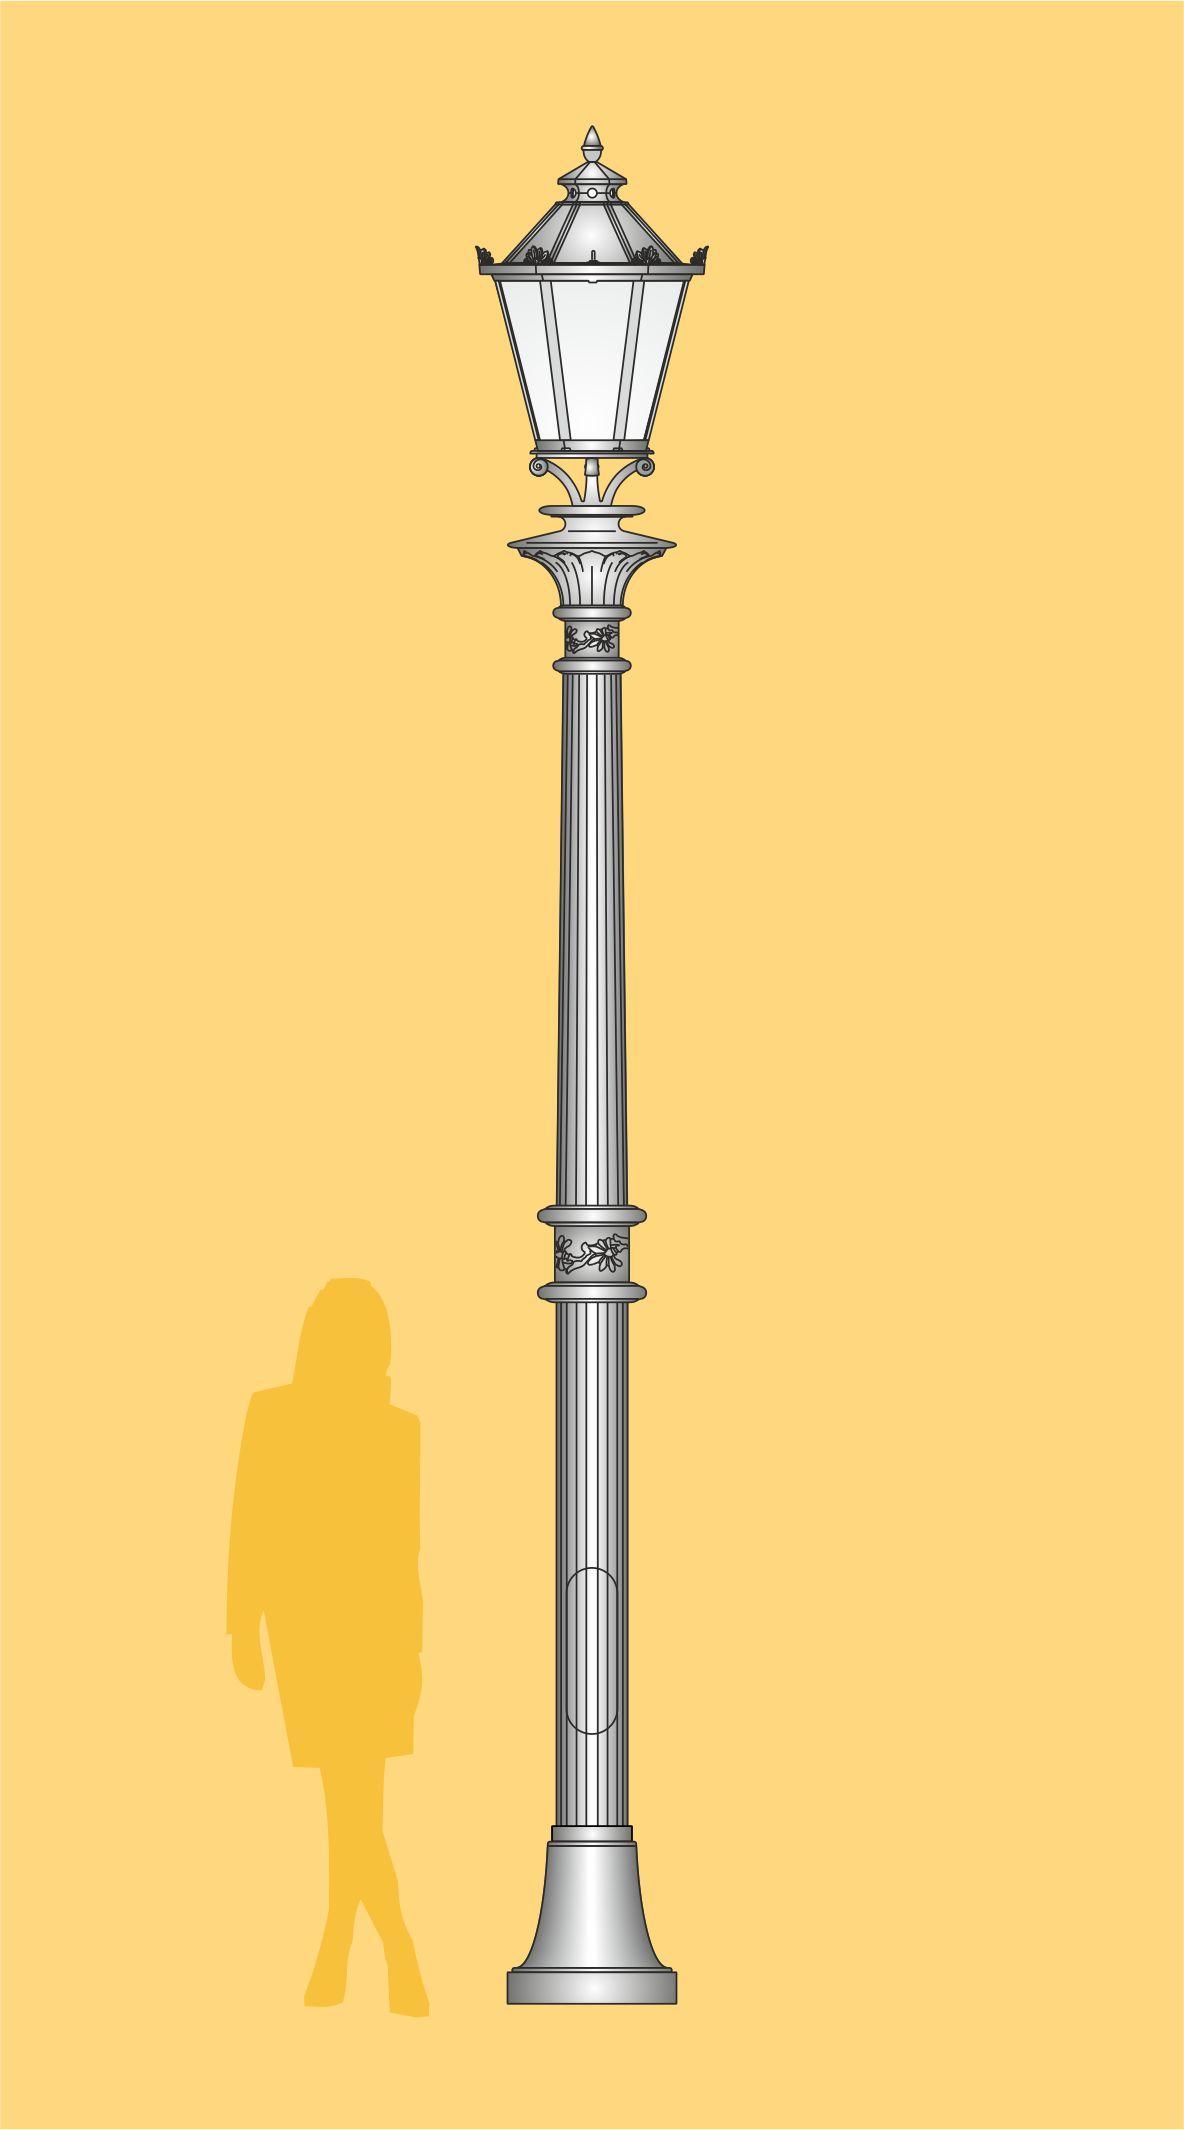 latarnia stylowa, ekskluzywna latarnia ogrodowa, latarnia palacowa, oprawa LED